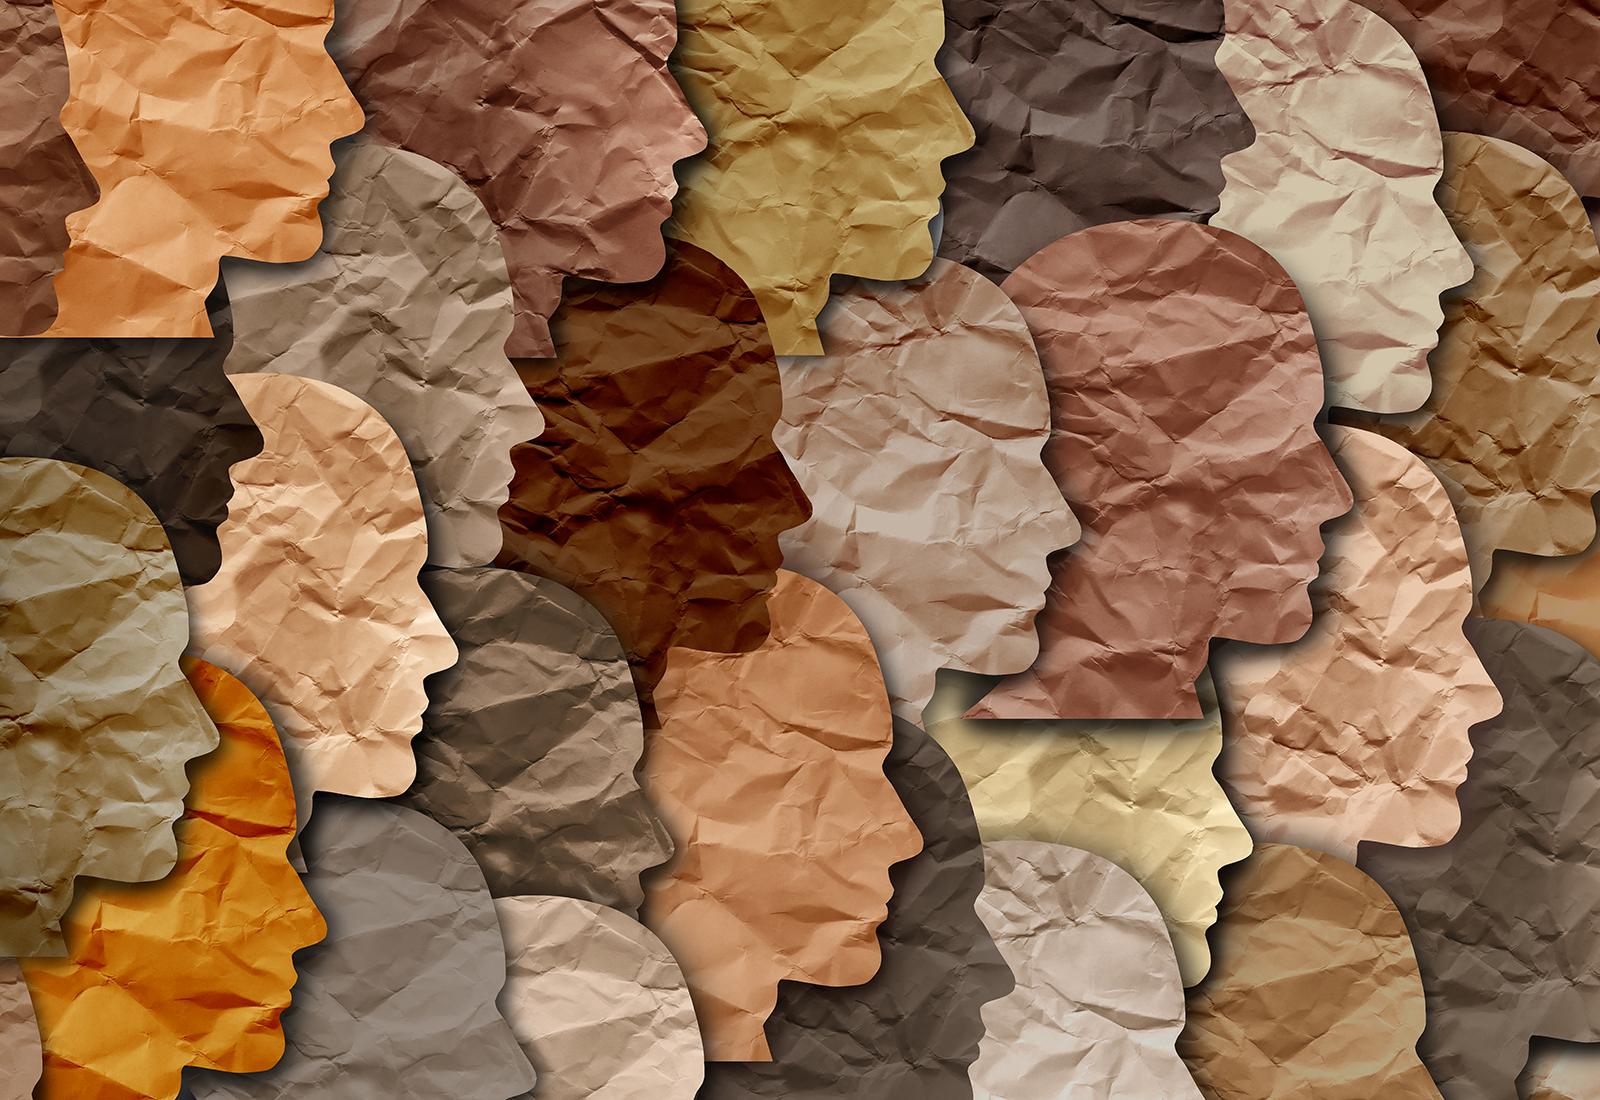 graphic design of diverse faces